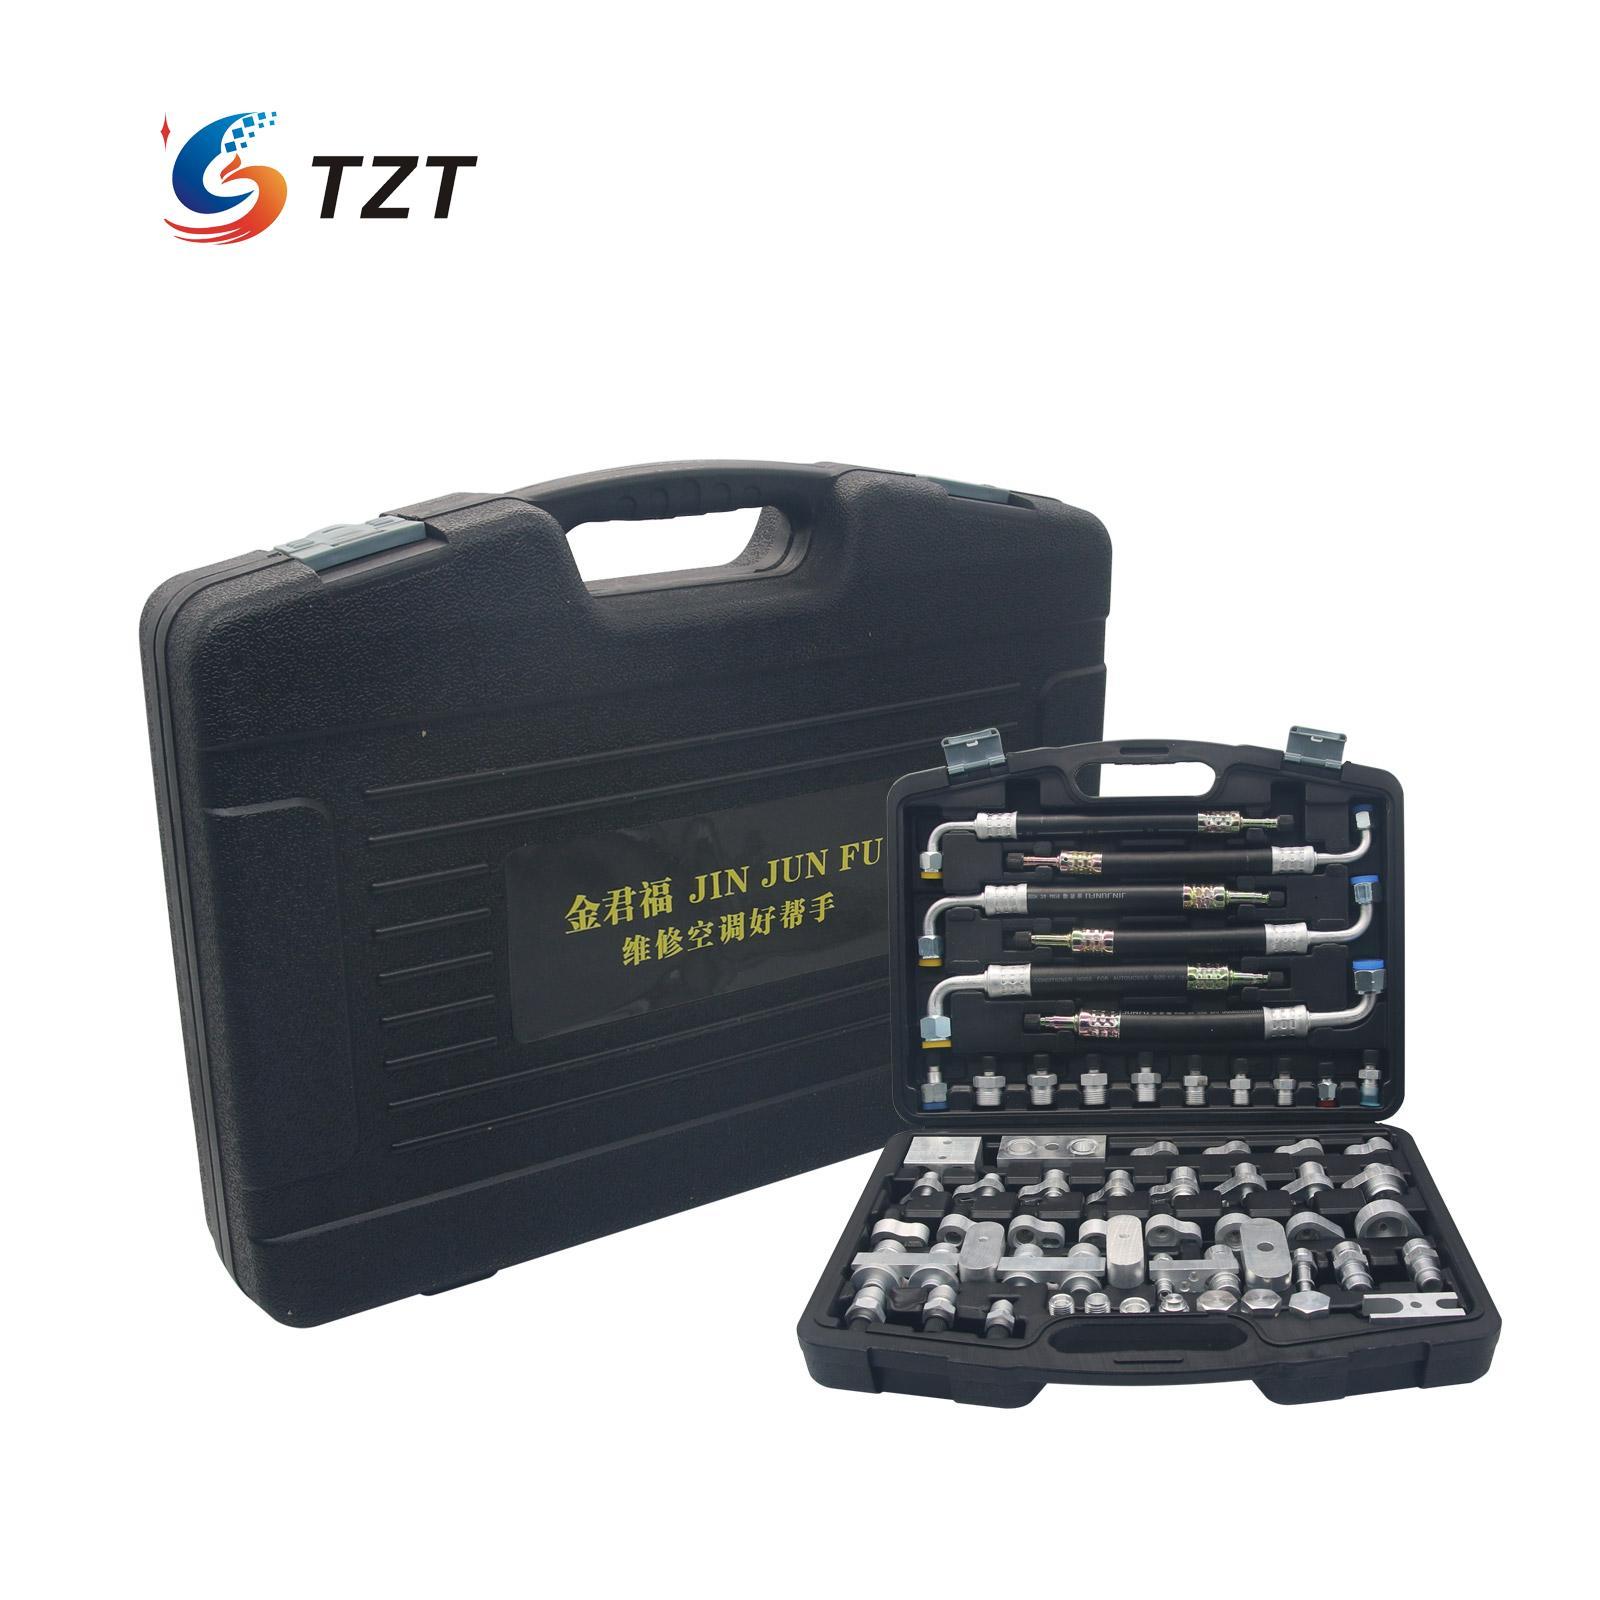 Air Conditioning Leak Detector Detection Tools Auto Repair Tool for Car Truck Black недорого